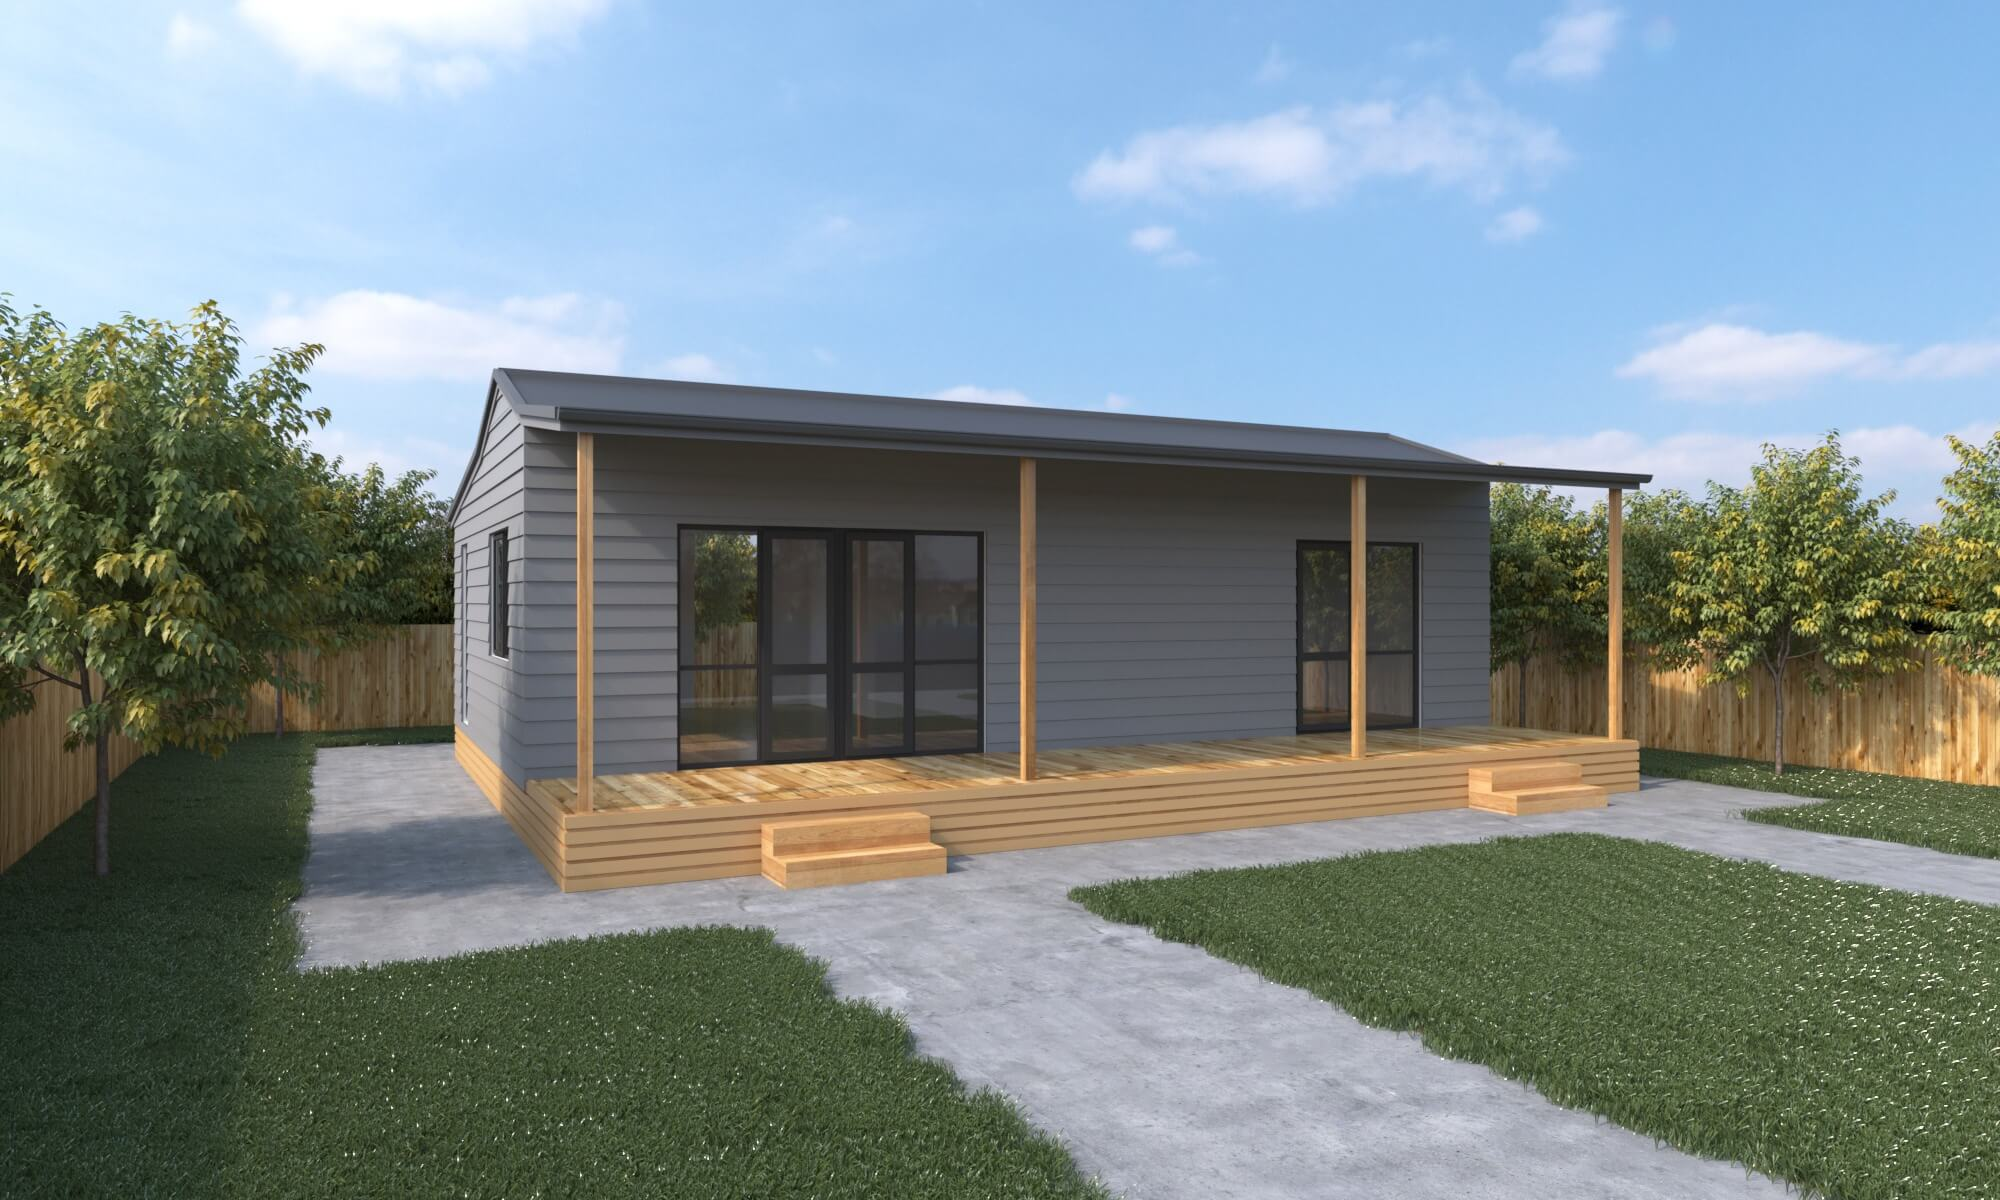 2 Bedroom prefab house - Cottage 2